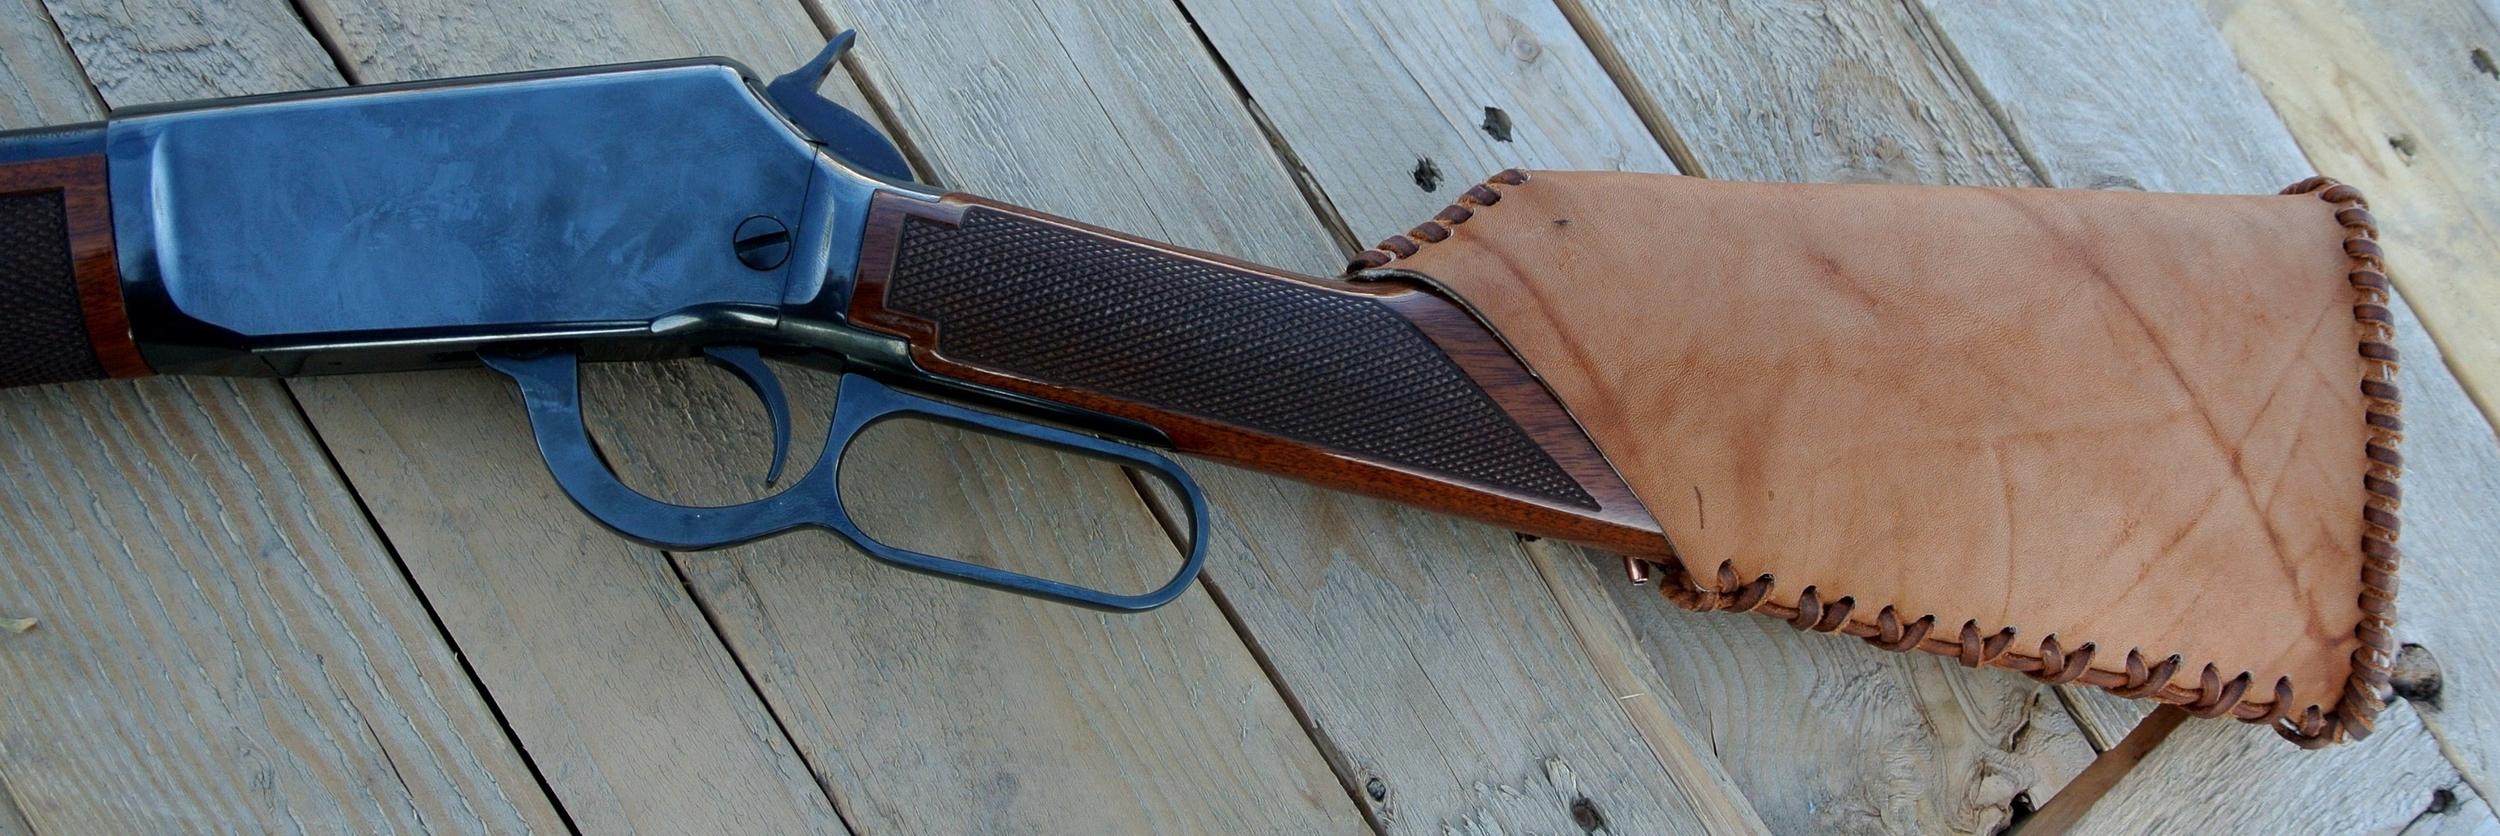 Circle M-Brand - Leather Buttstock Cuff (.22 magnum).JPG